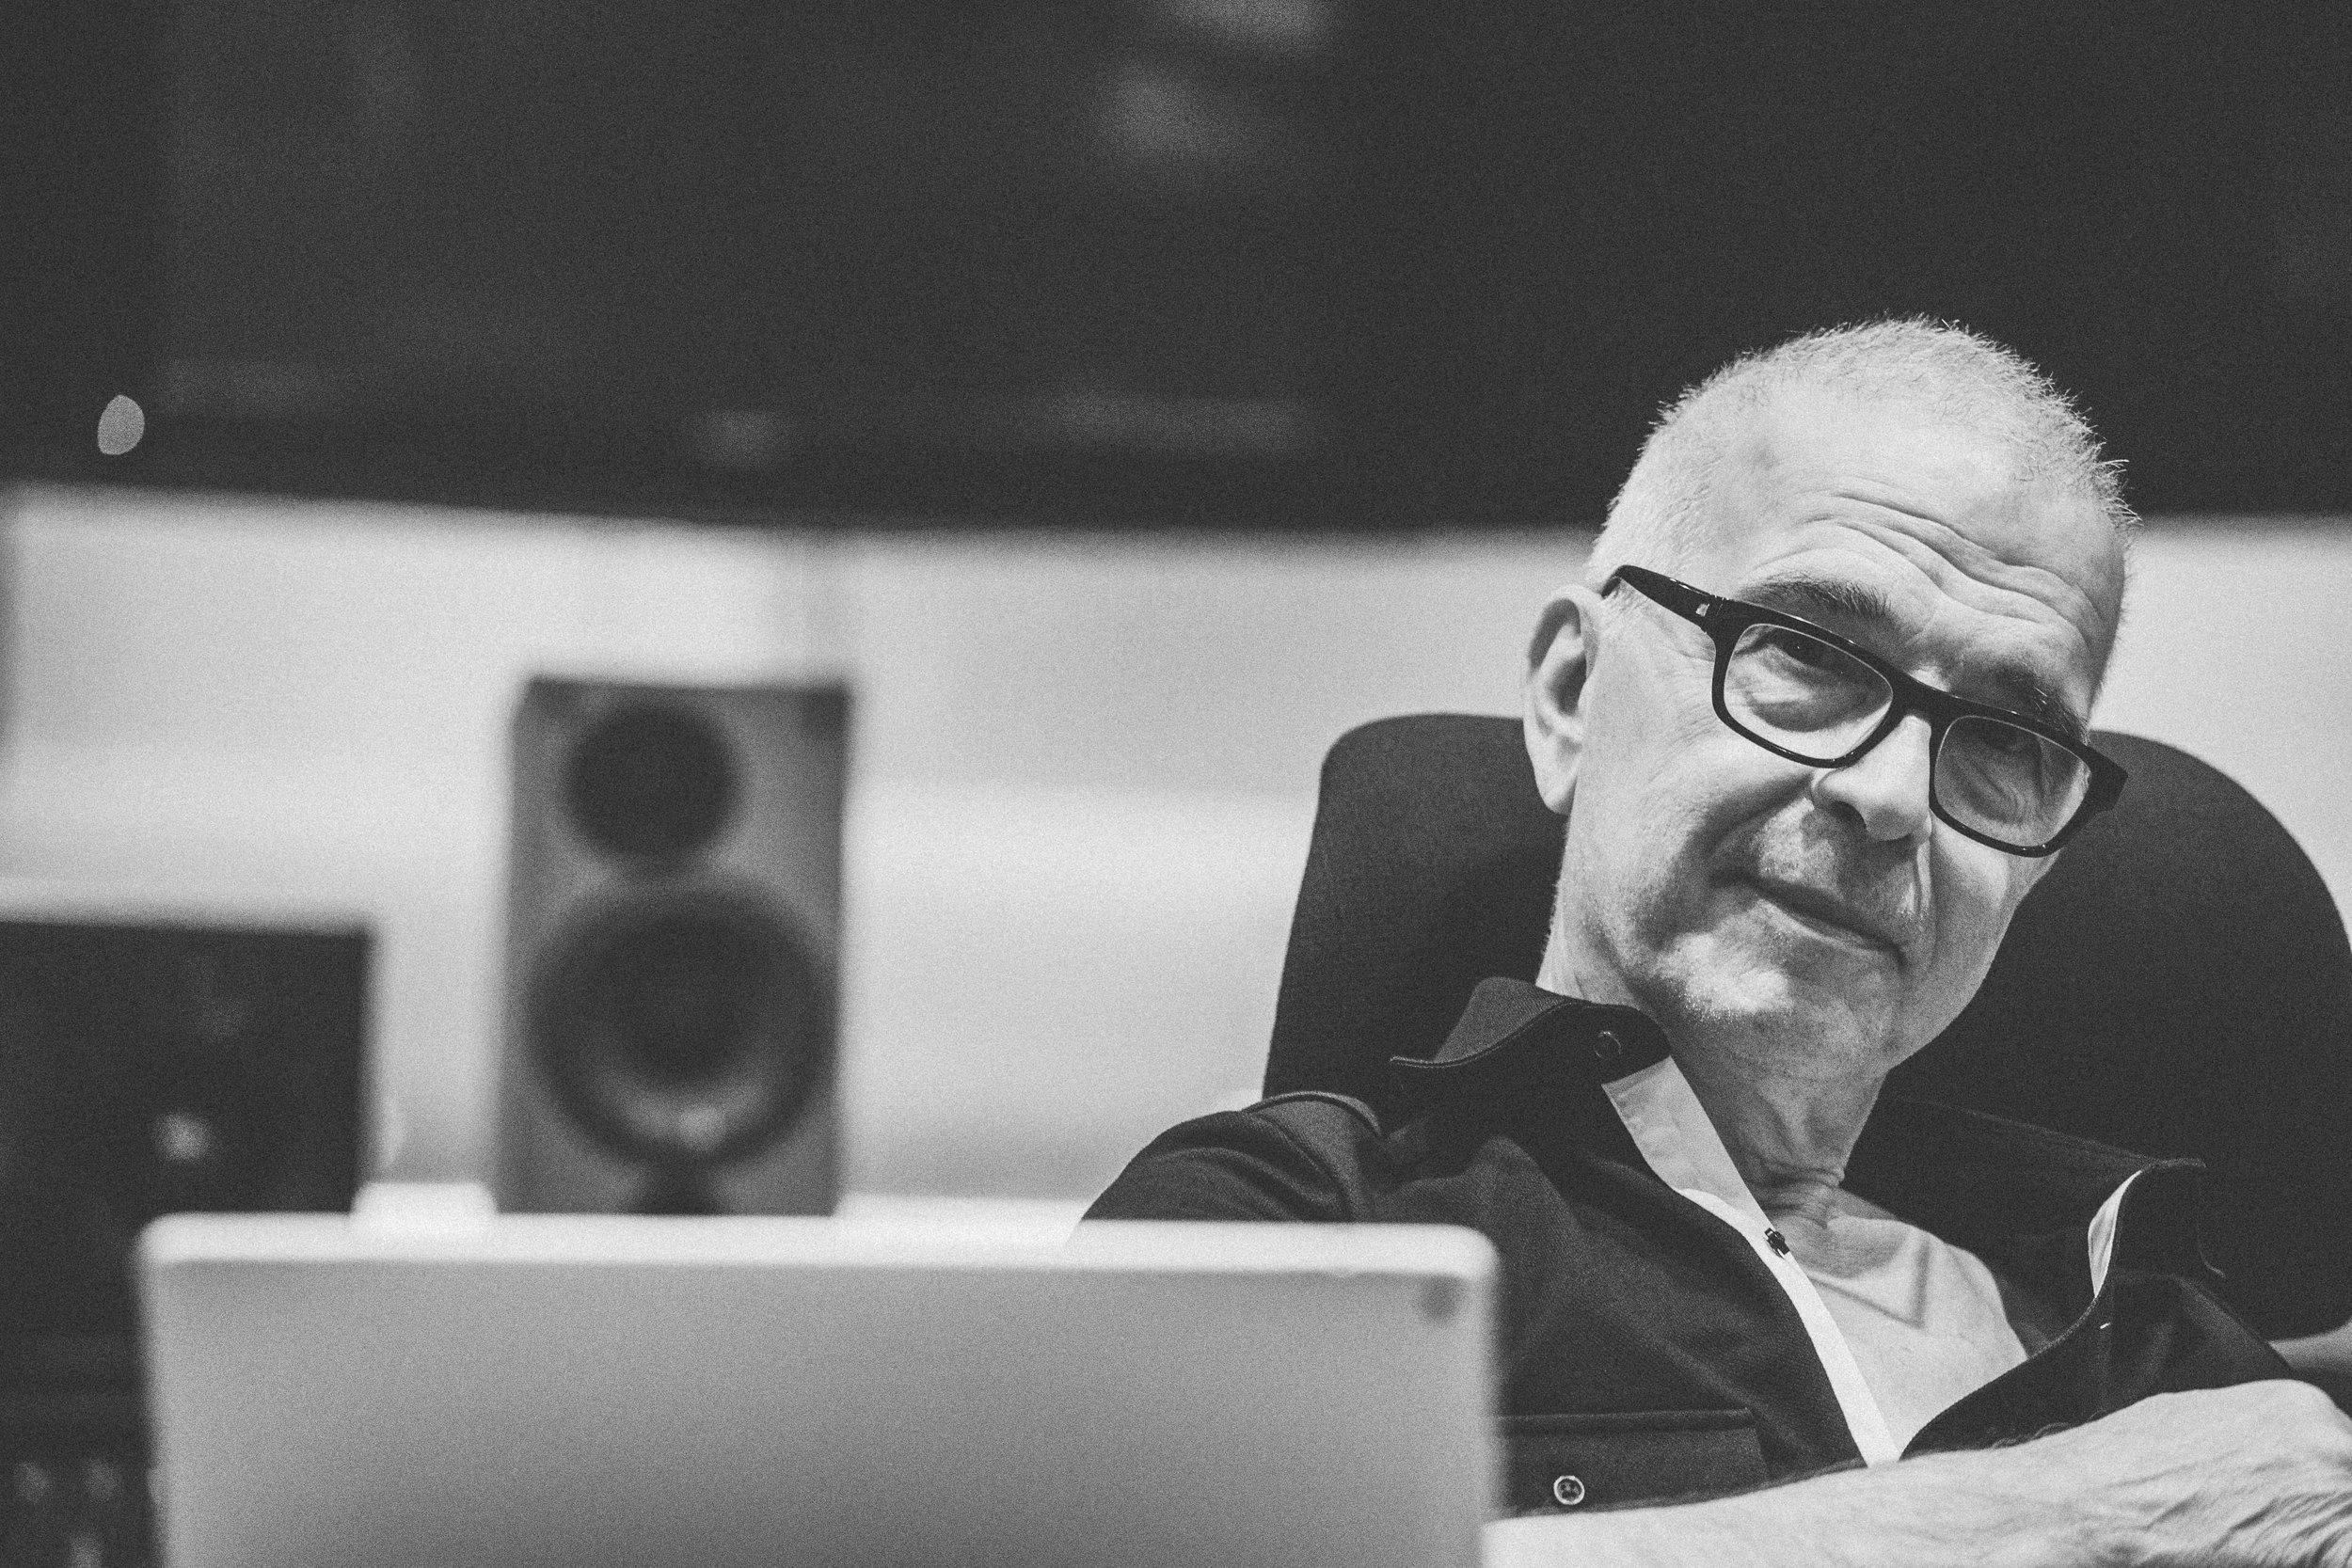 Tony Visconti in studio for Daphne Guinness session - Fiona Garden 2016